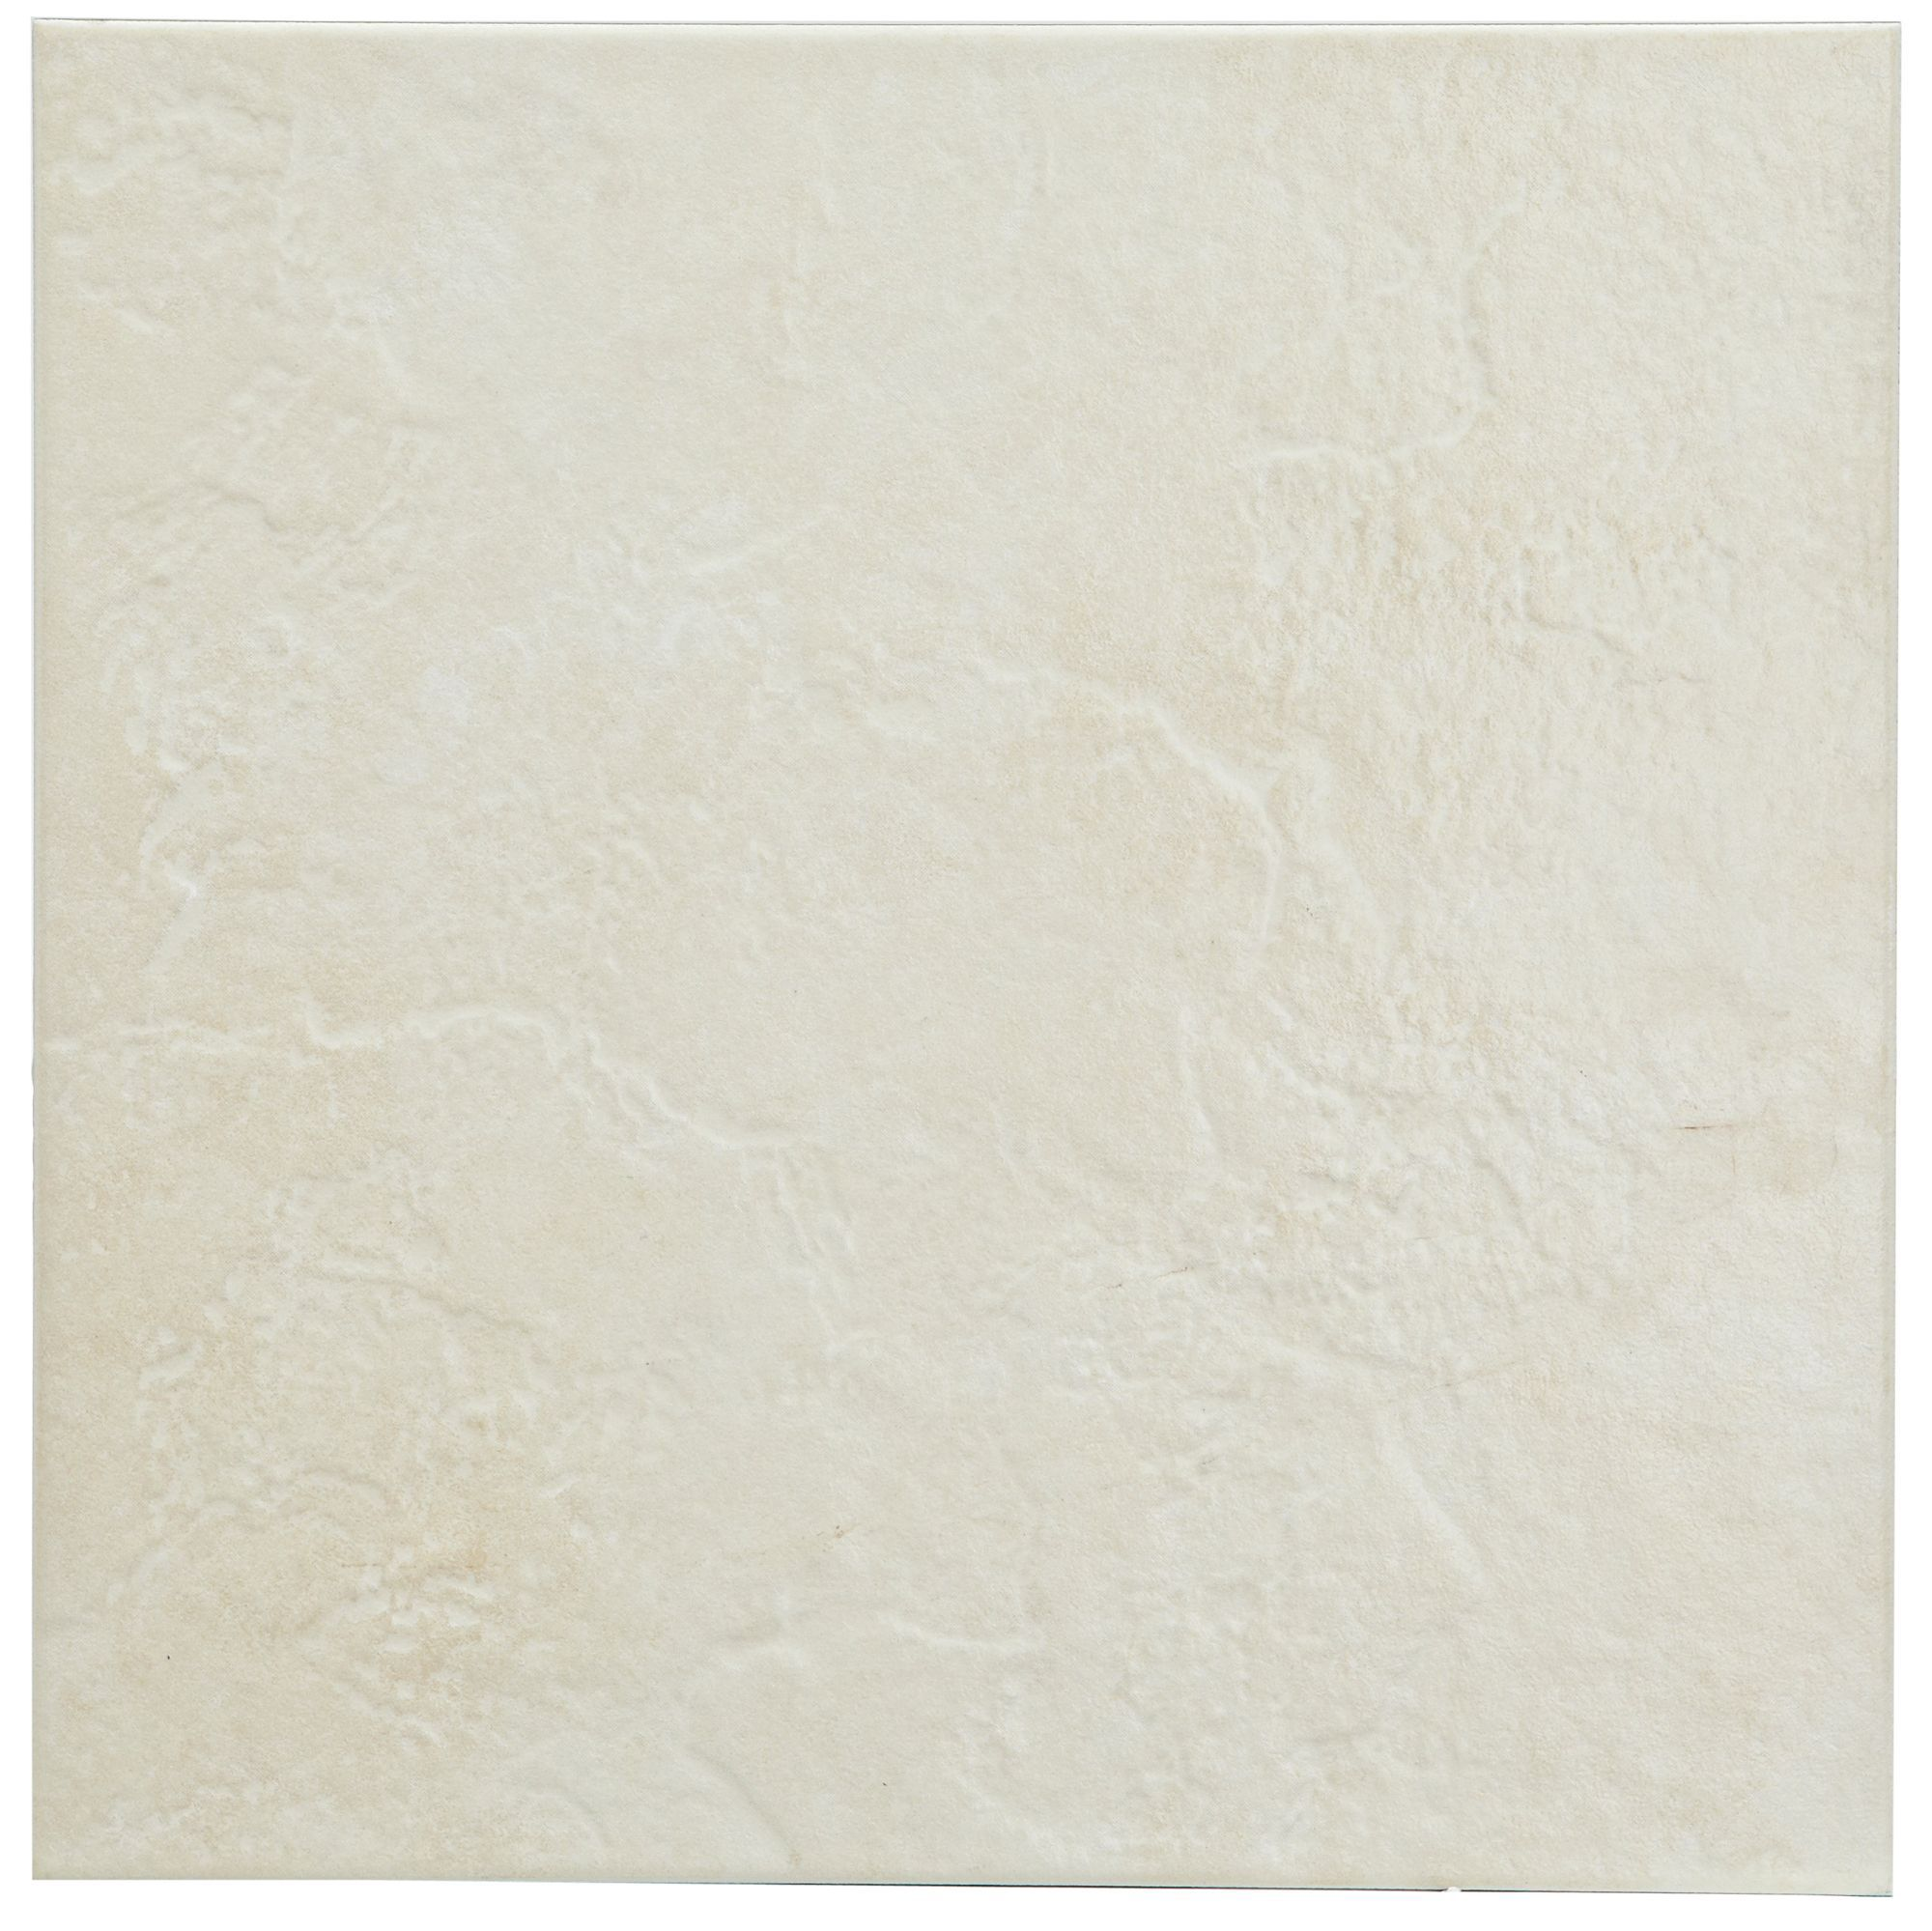 Cara White Amp Silver Ceramic Border Tile L200mm W50mm